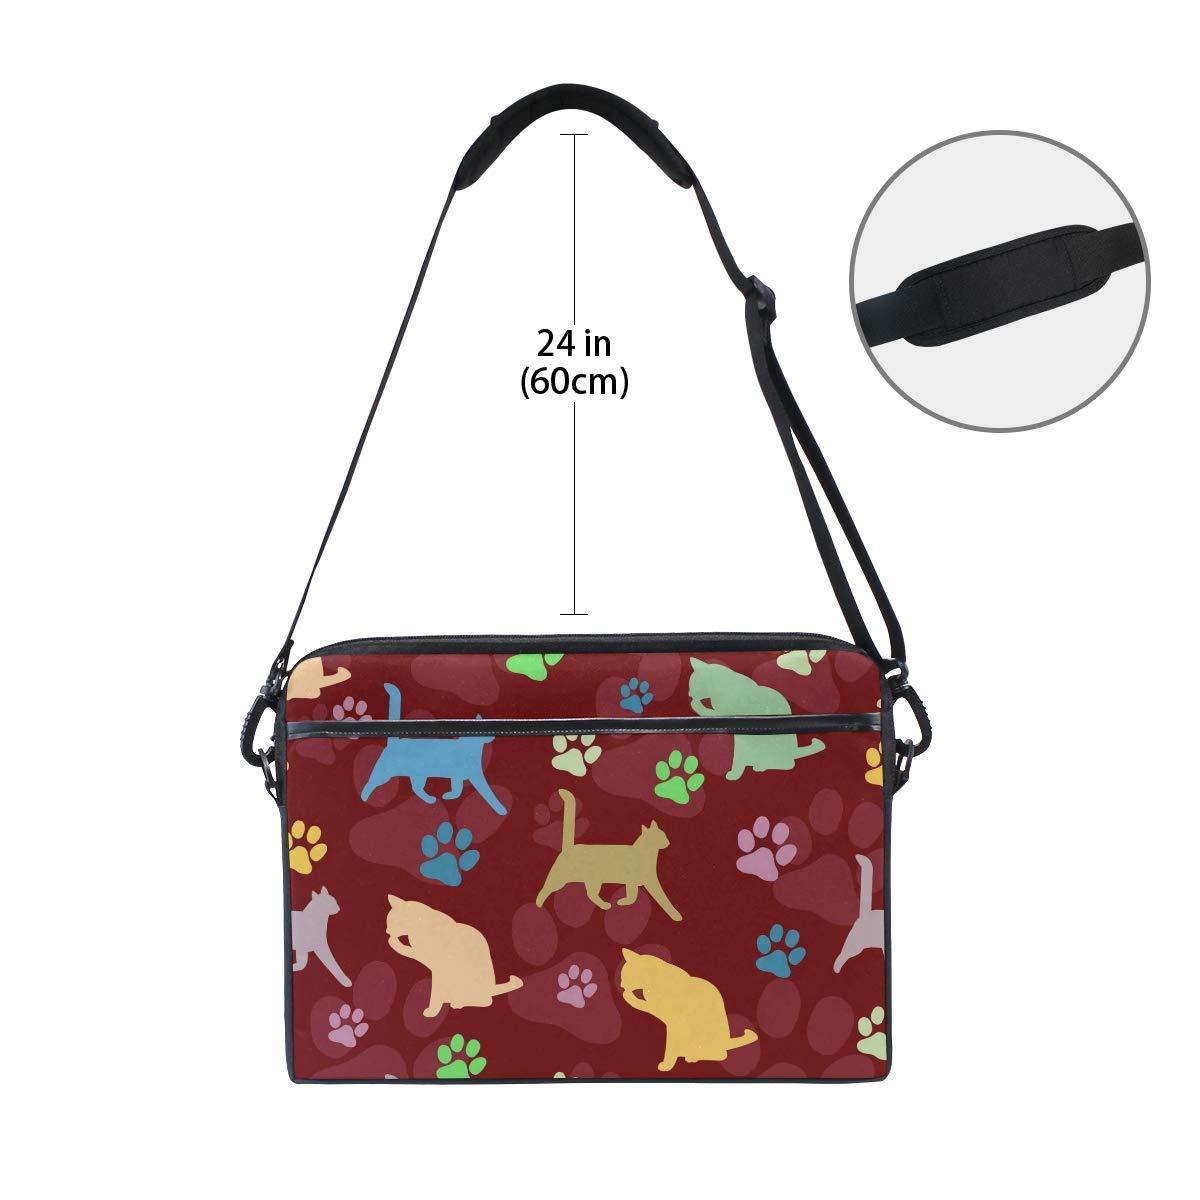 imobaby Purple Beautiful Flower Design Laptop Messenger Shoulder Bag Notebook Sleeve Carrying Briefcase Handbag 15-15.4 inches